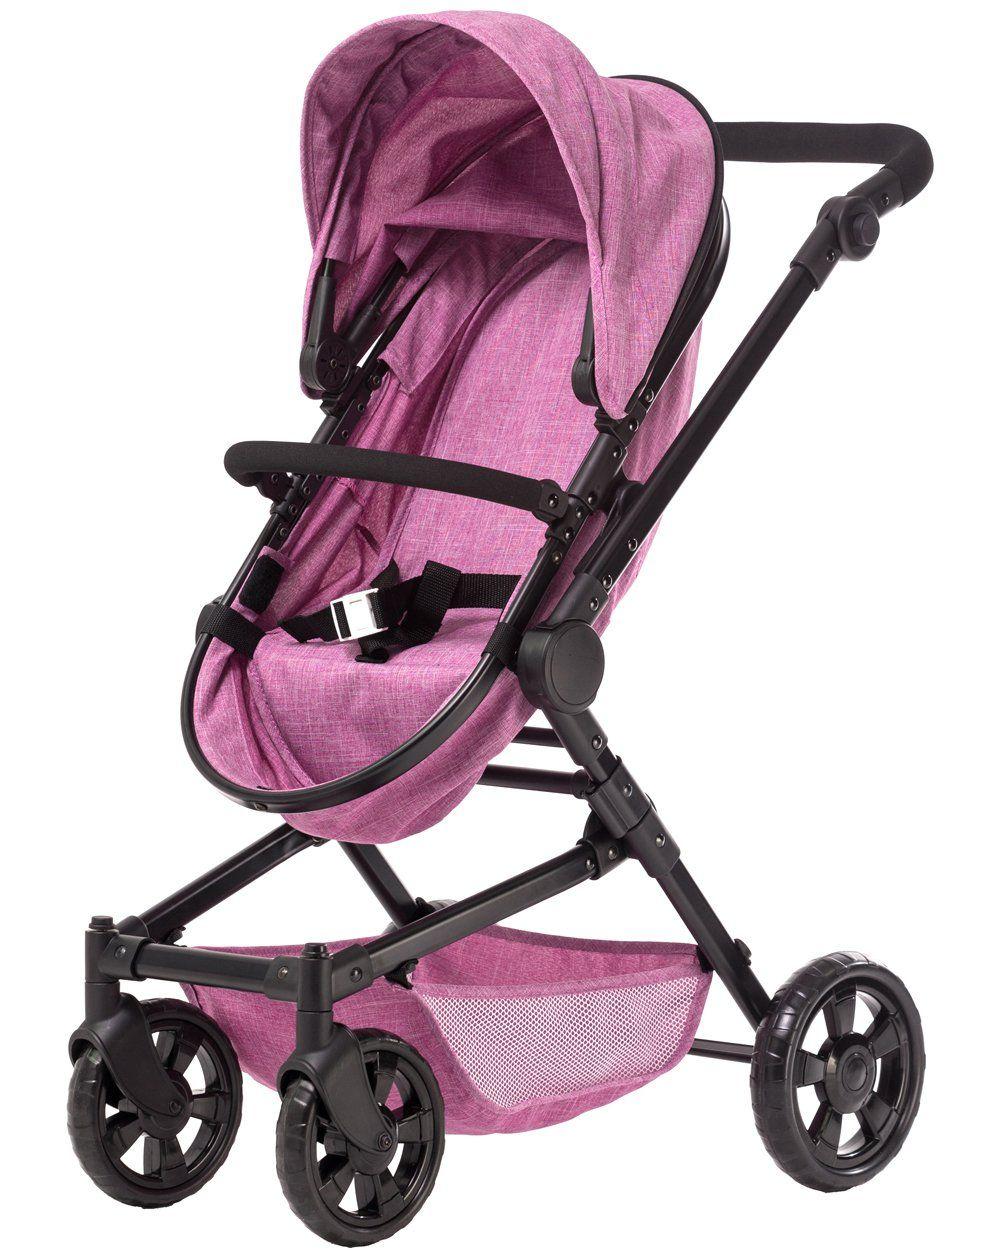 Triokid 2 in 1 Deluxe Baby Doll Stroller Sportline X1